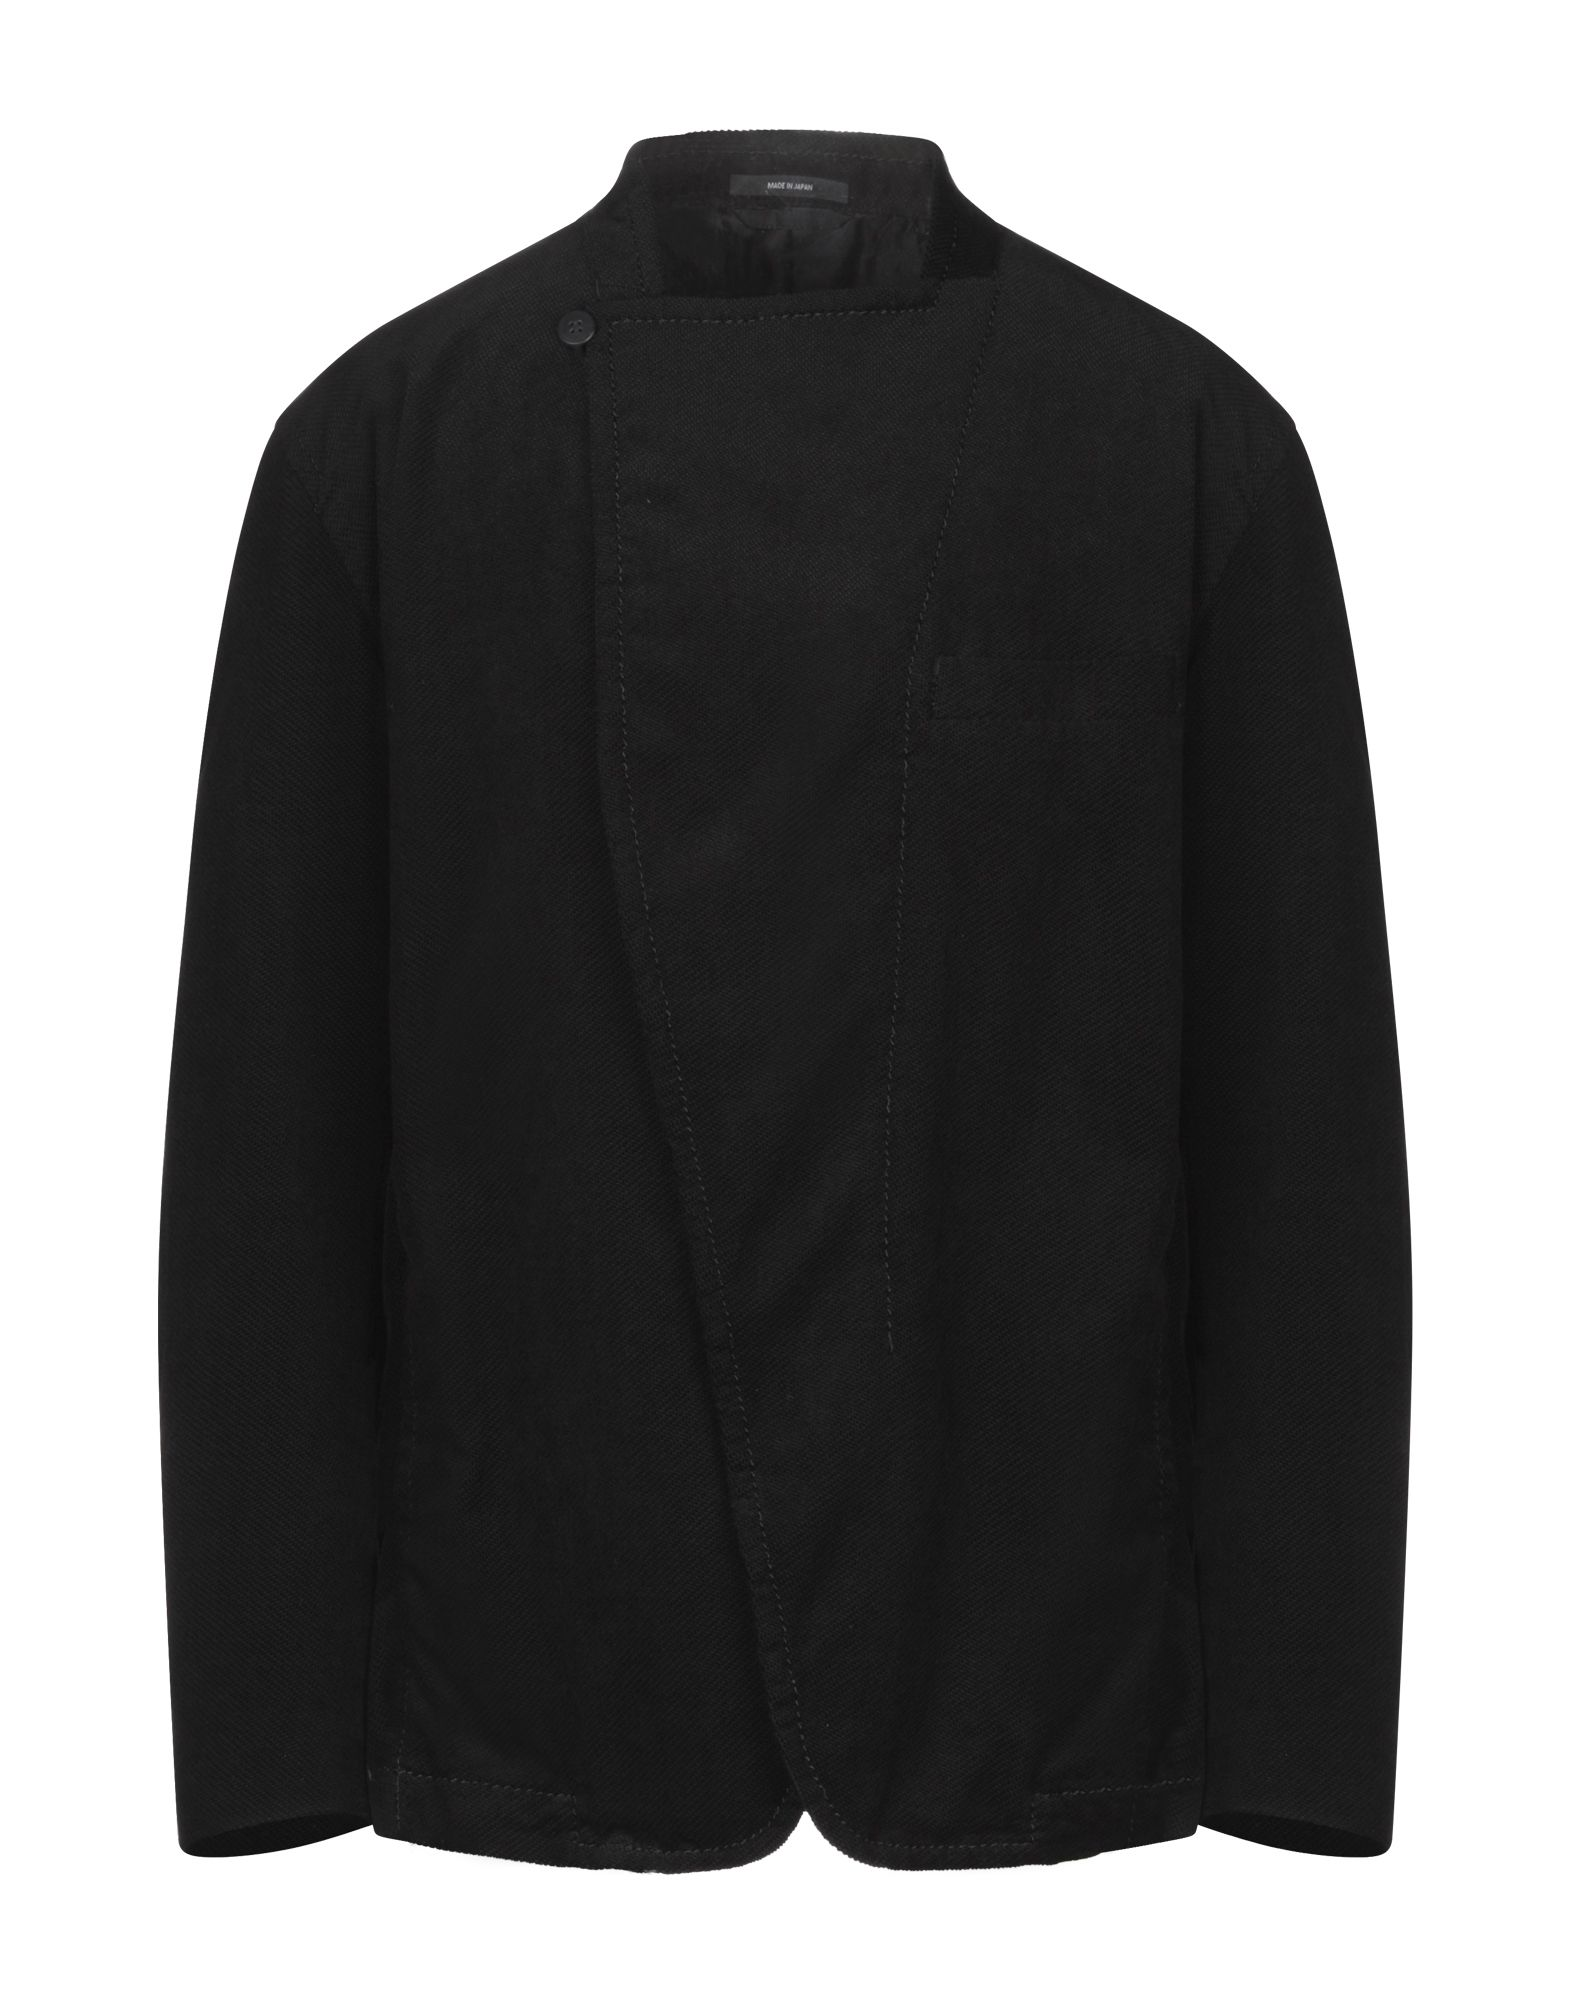 issey miyake cauliflower легкое пальто ISSEY MIYAKE MEN Легкое пальто